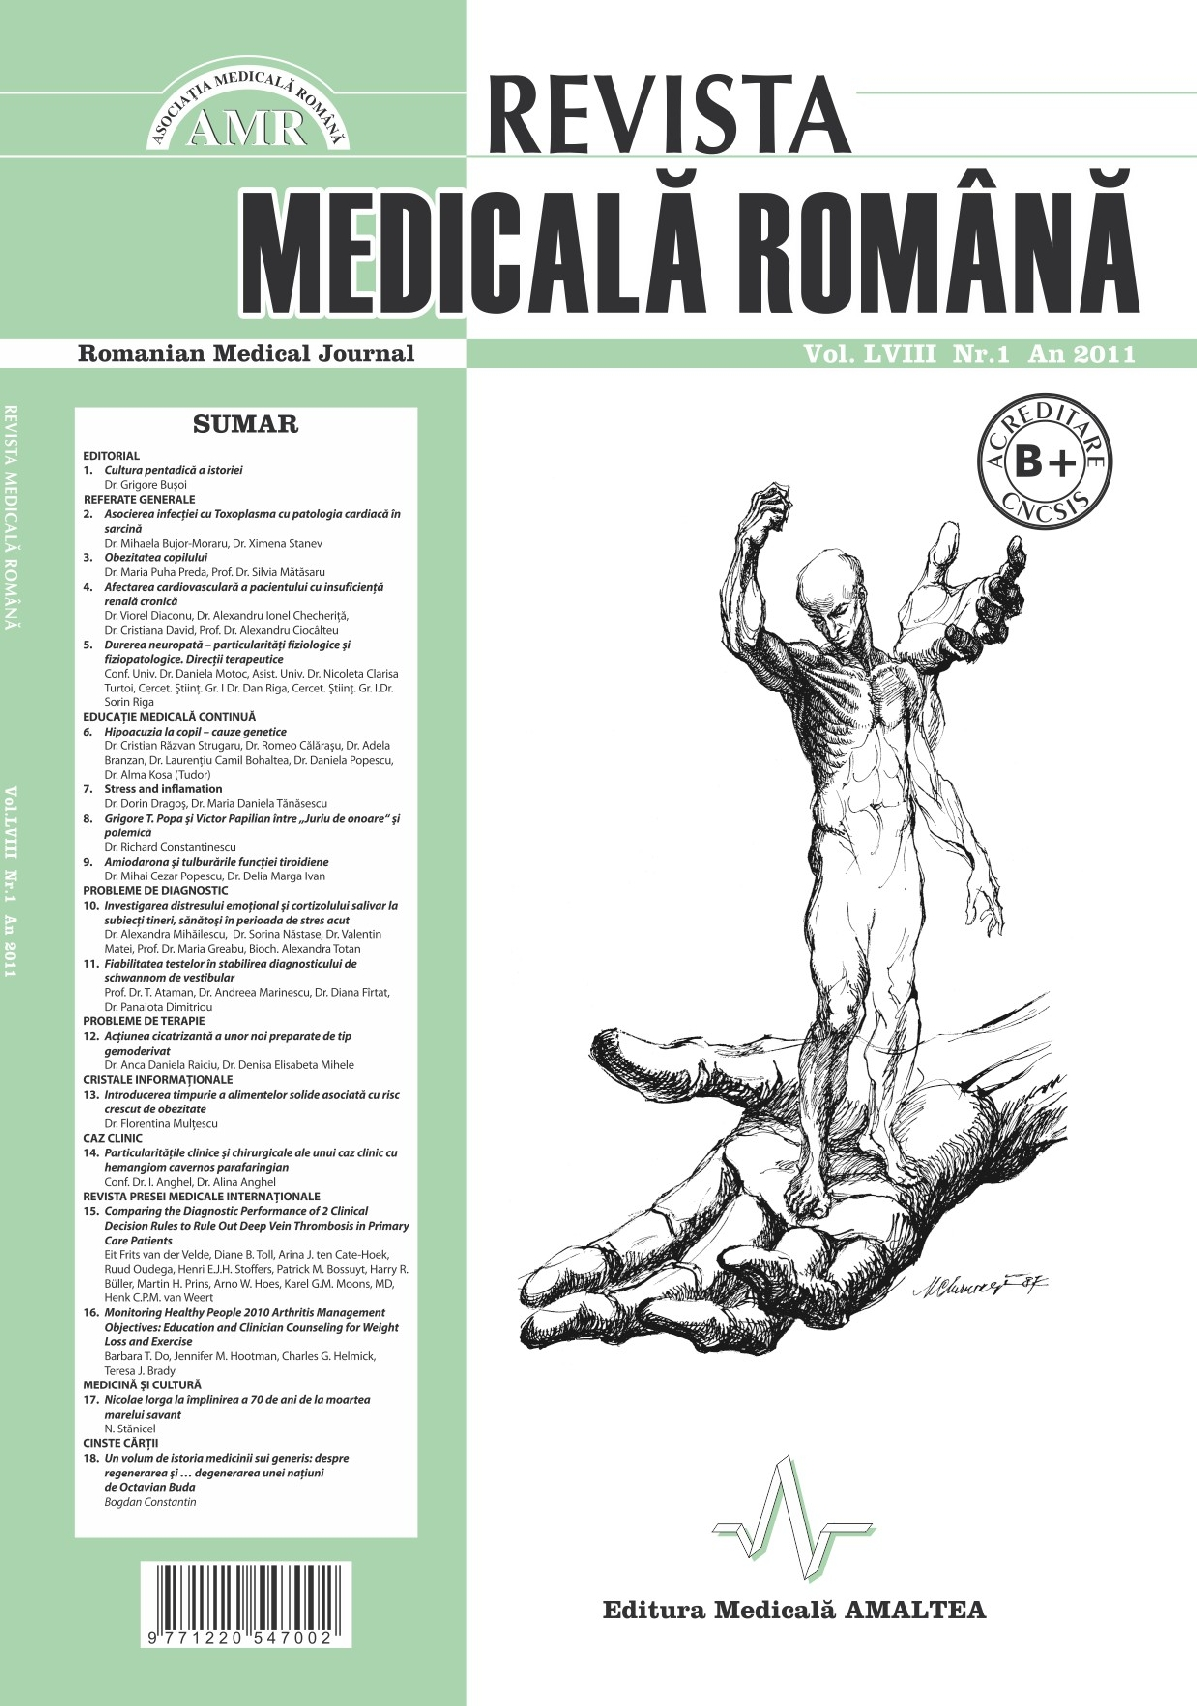 REVISTA MEDICALA ROMANA - Romanian Medical Journal, Vol. LVIII, Nr. 1, An 2011